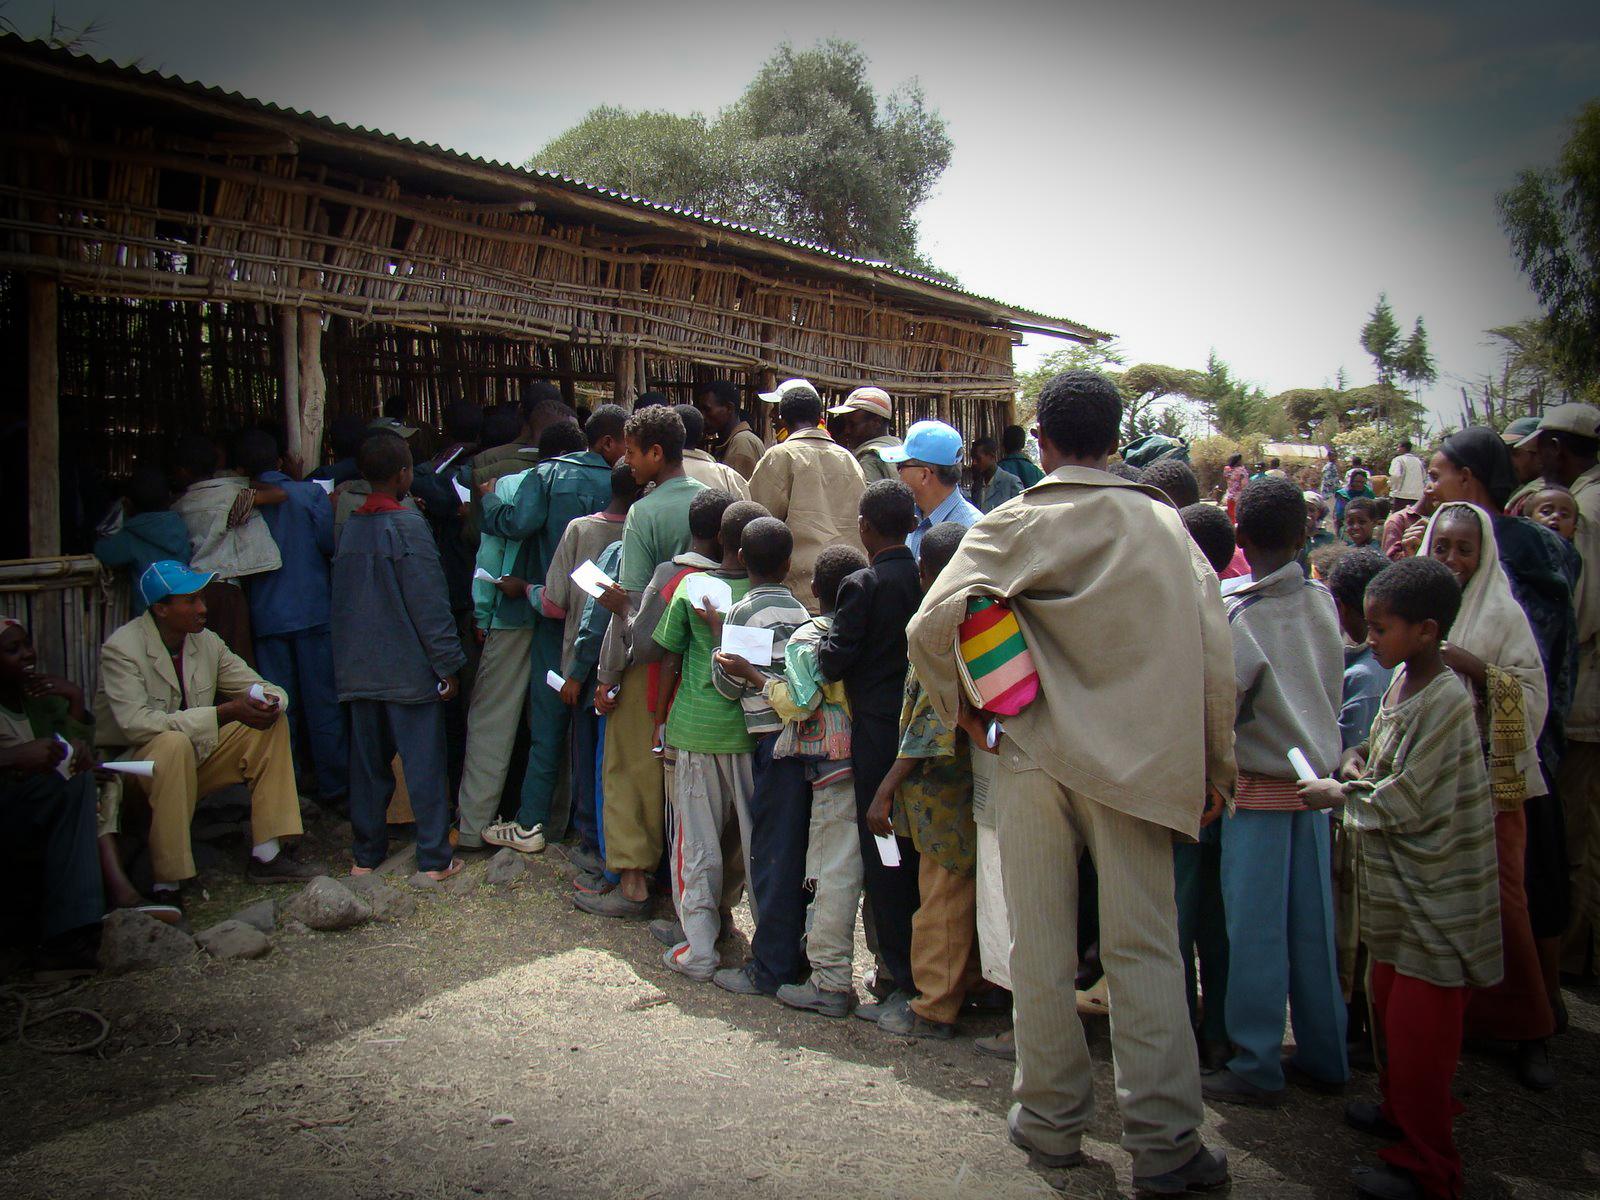 Ethiopia-2008-by-S.-Hur-387